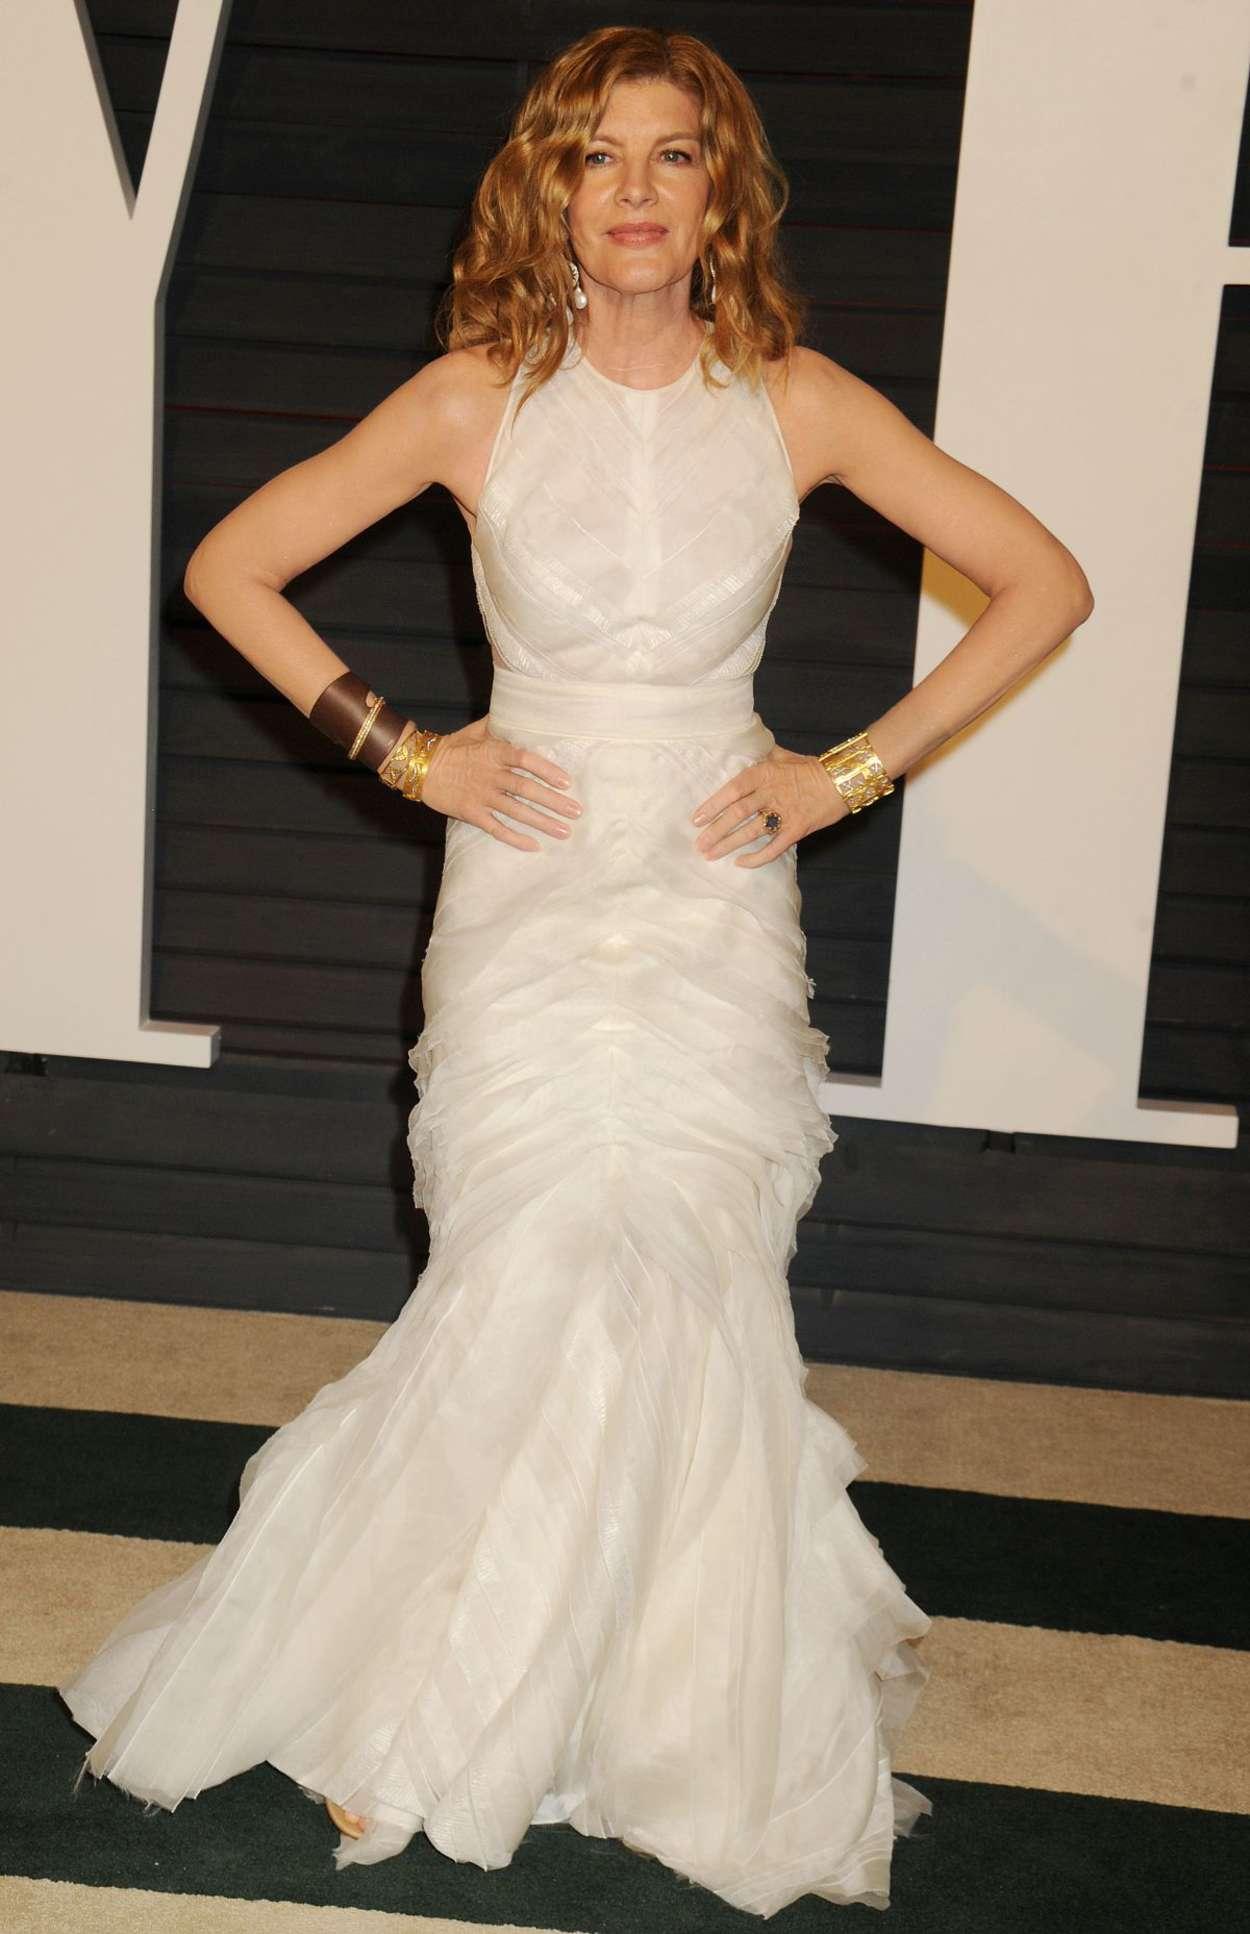 Rene Russo Vanity Fair Oscar Party in Hollywood